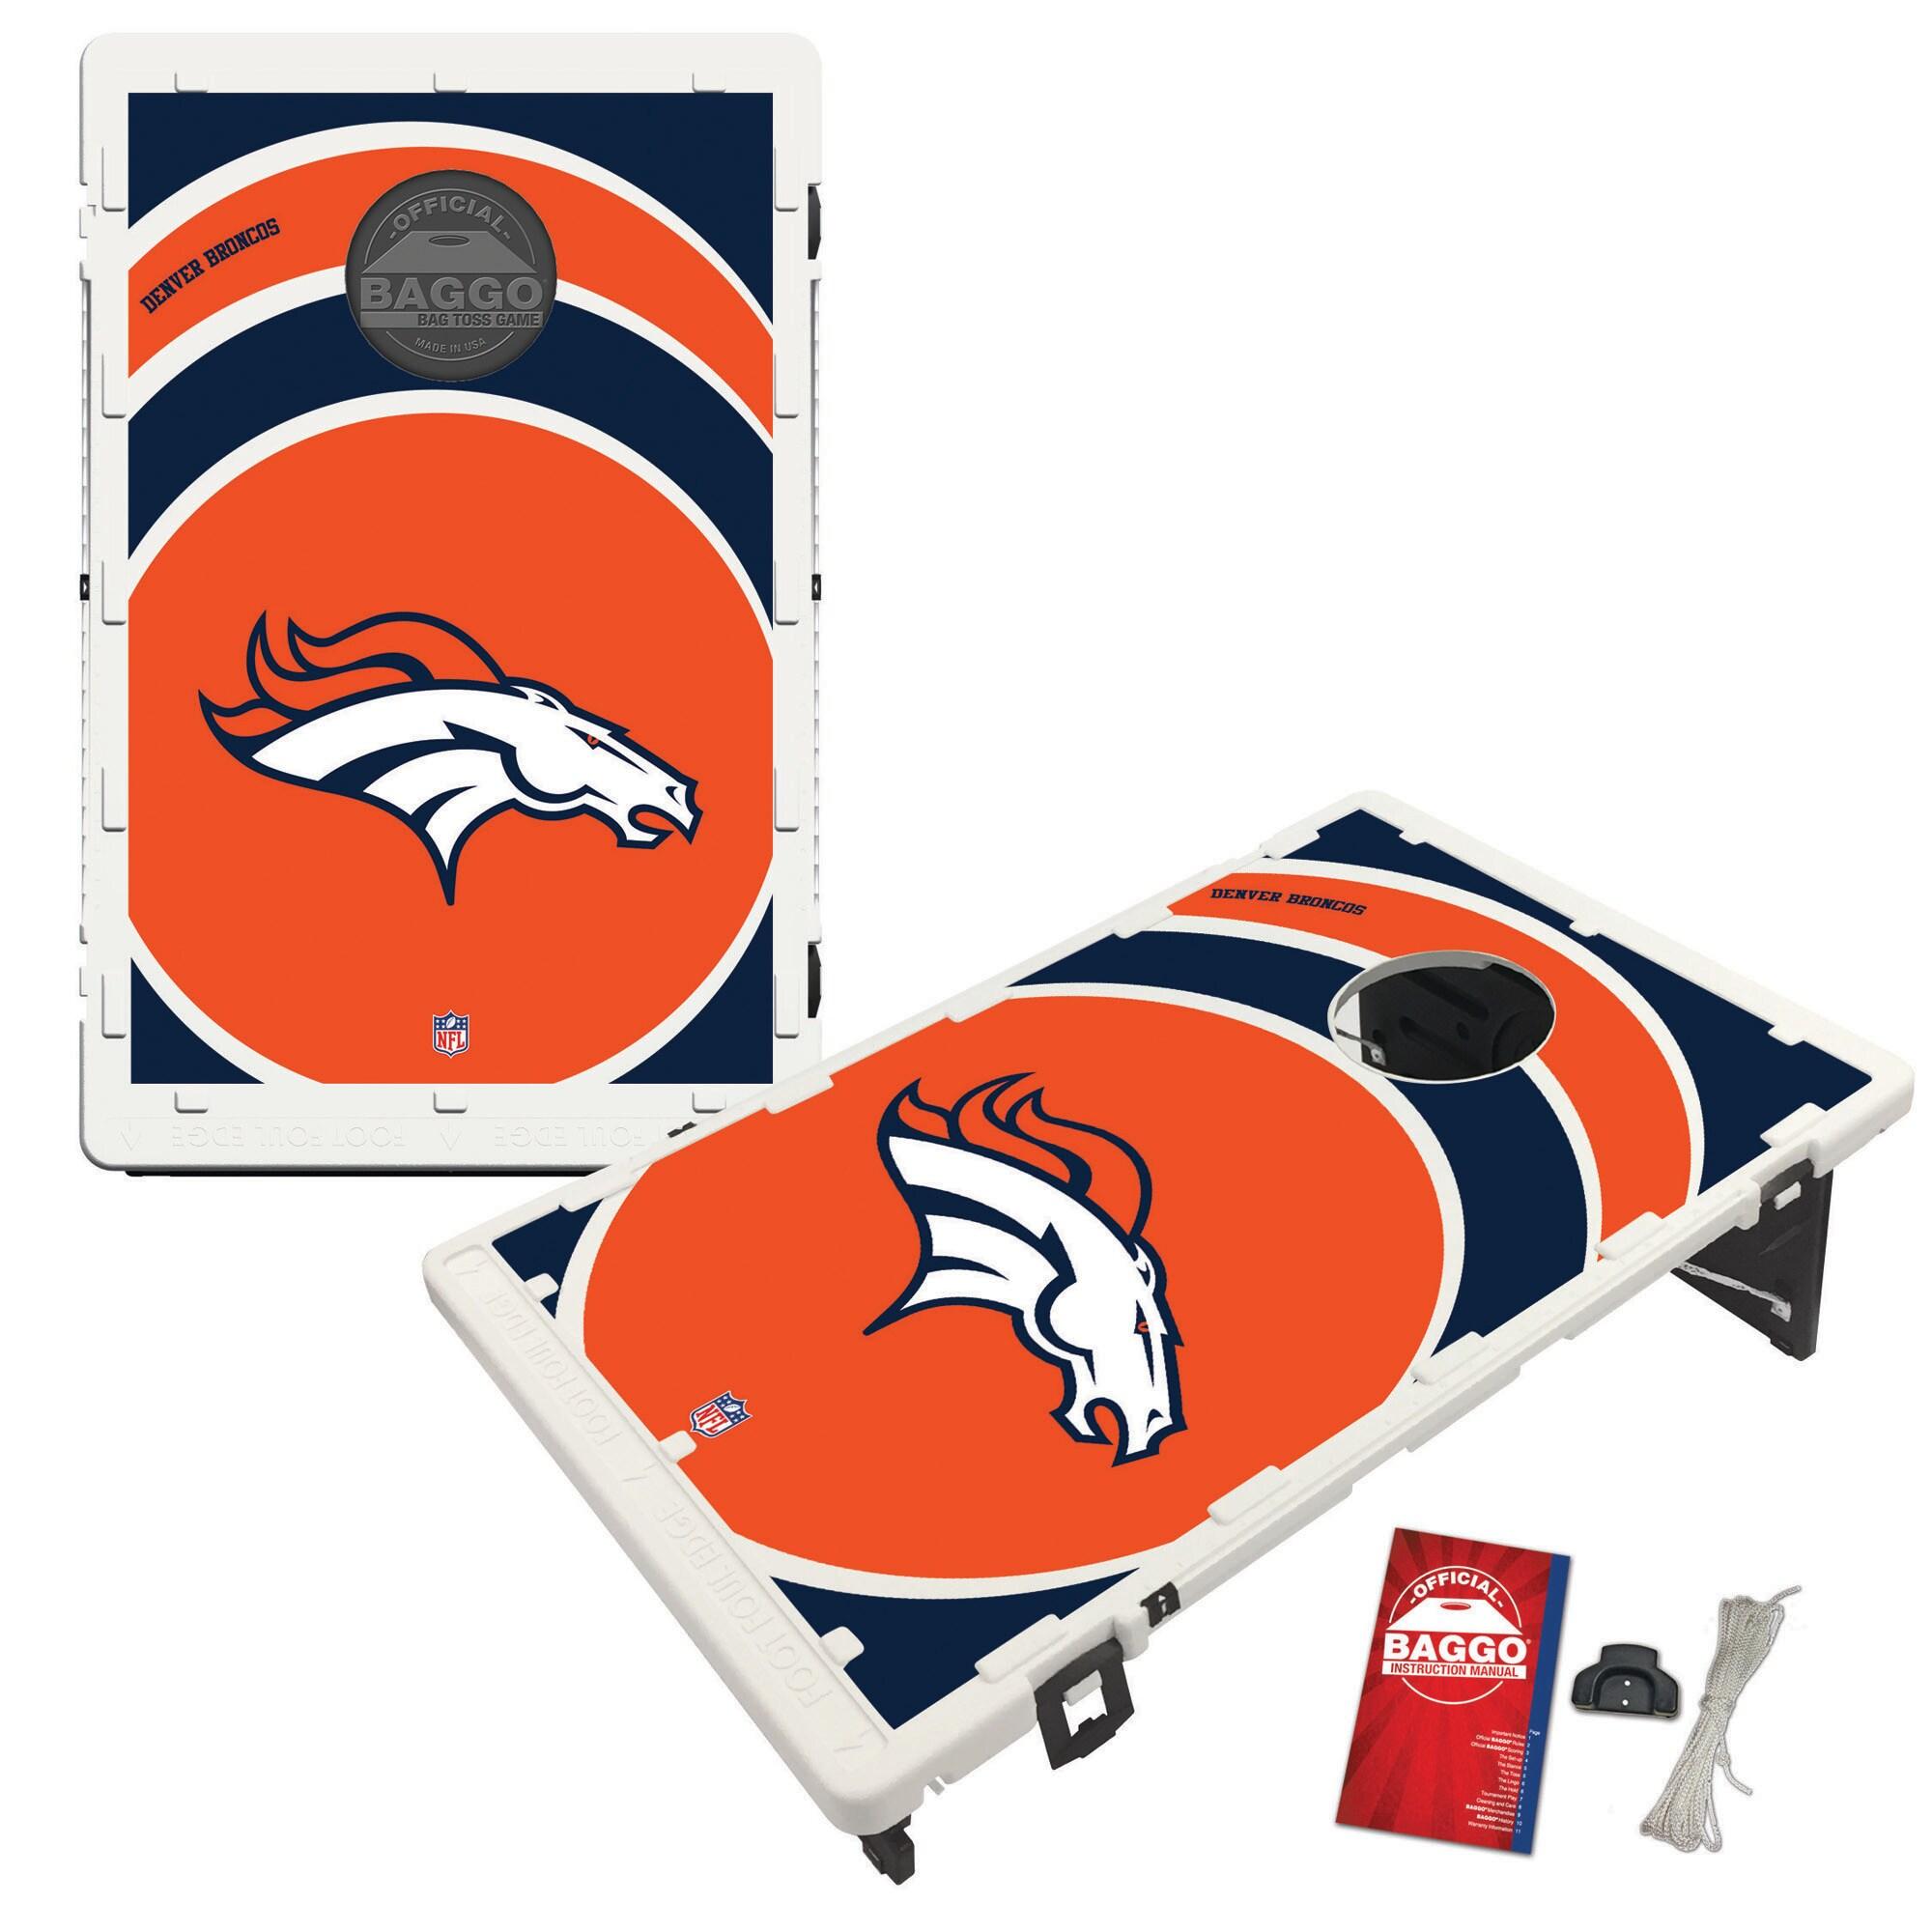 Denver Broncos 2' x 3' BAGGO Vortex Cornhole Board Tailgate Toss Set